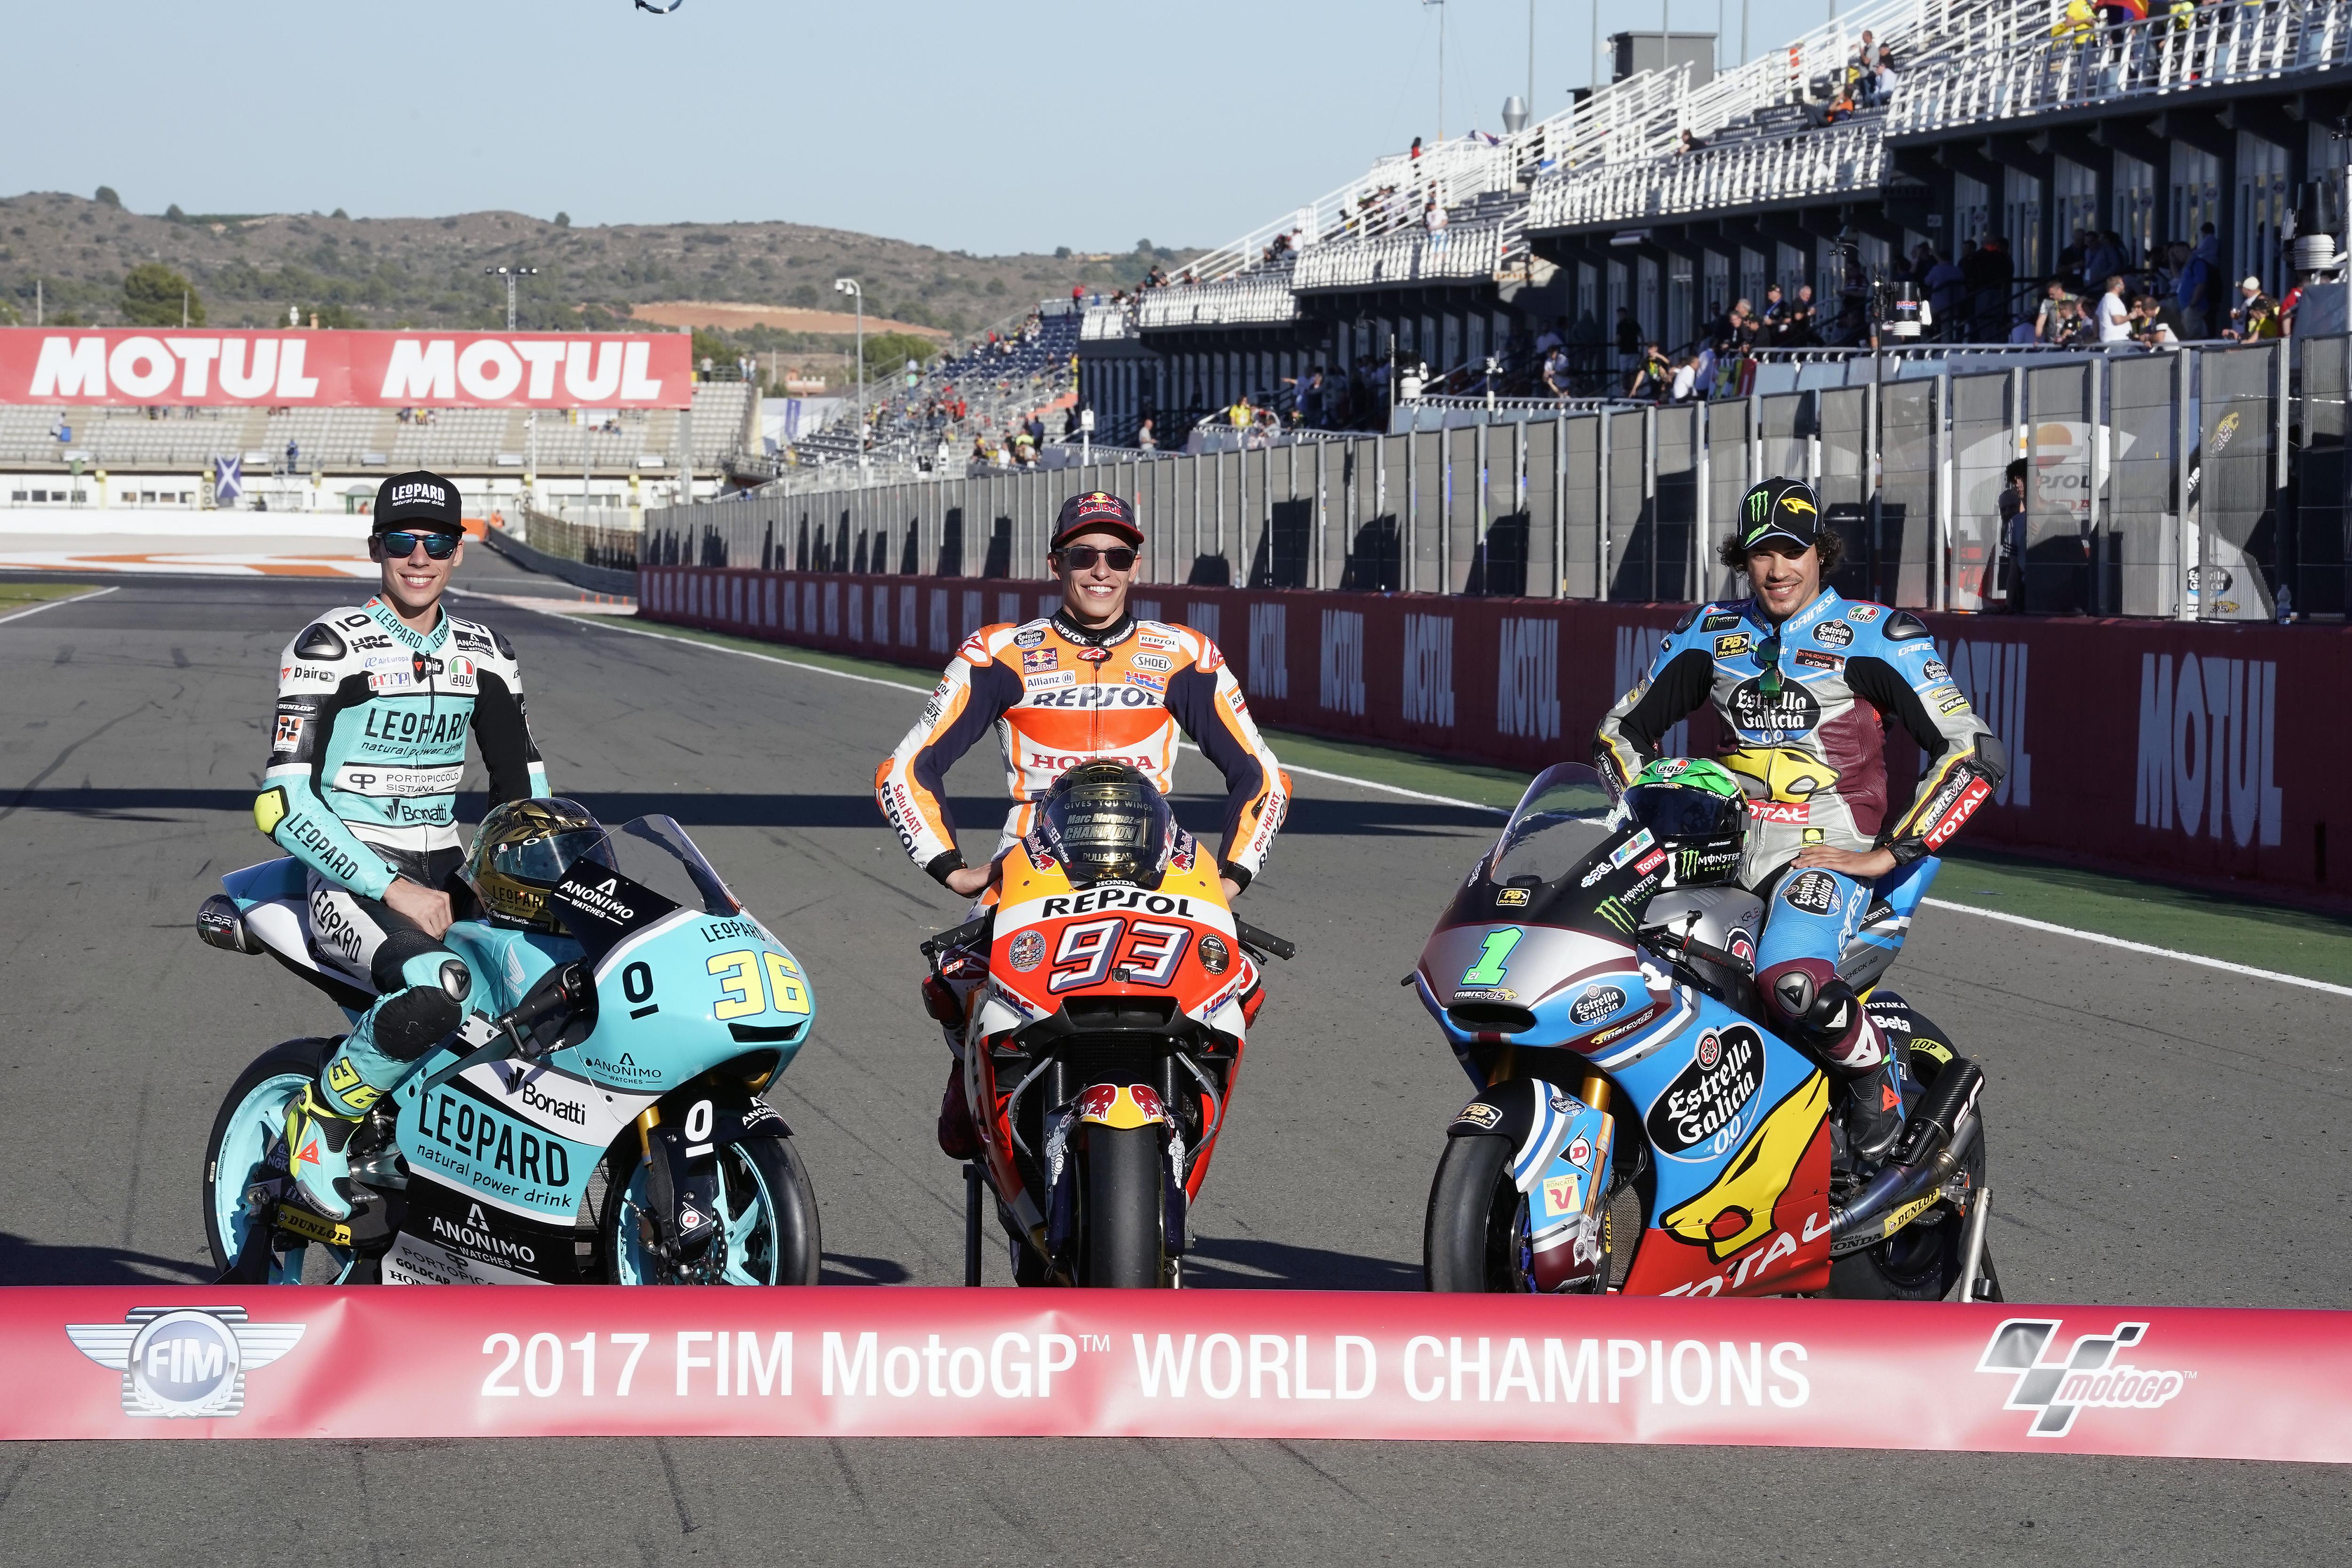 2017 World Champions